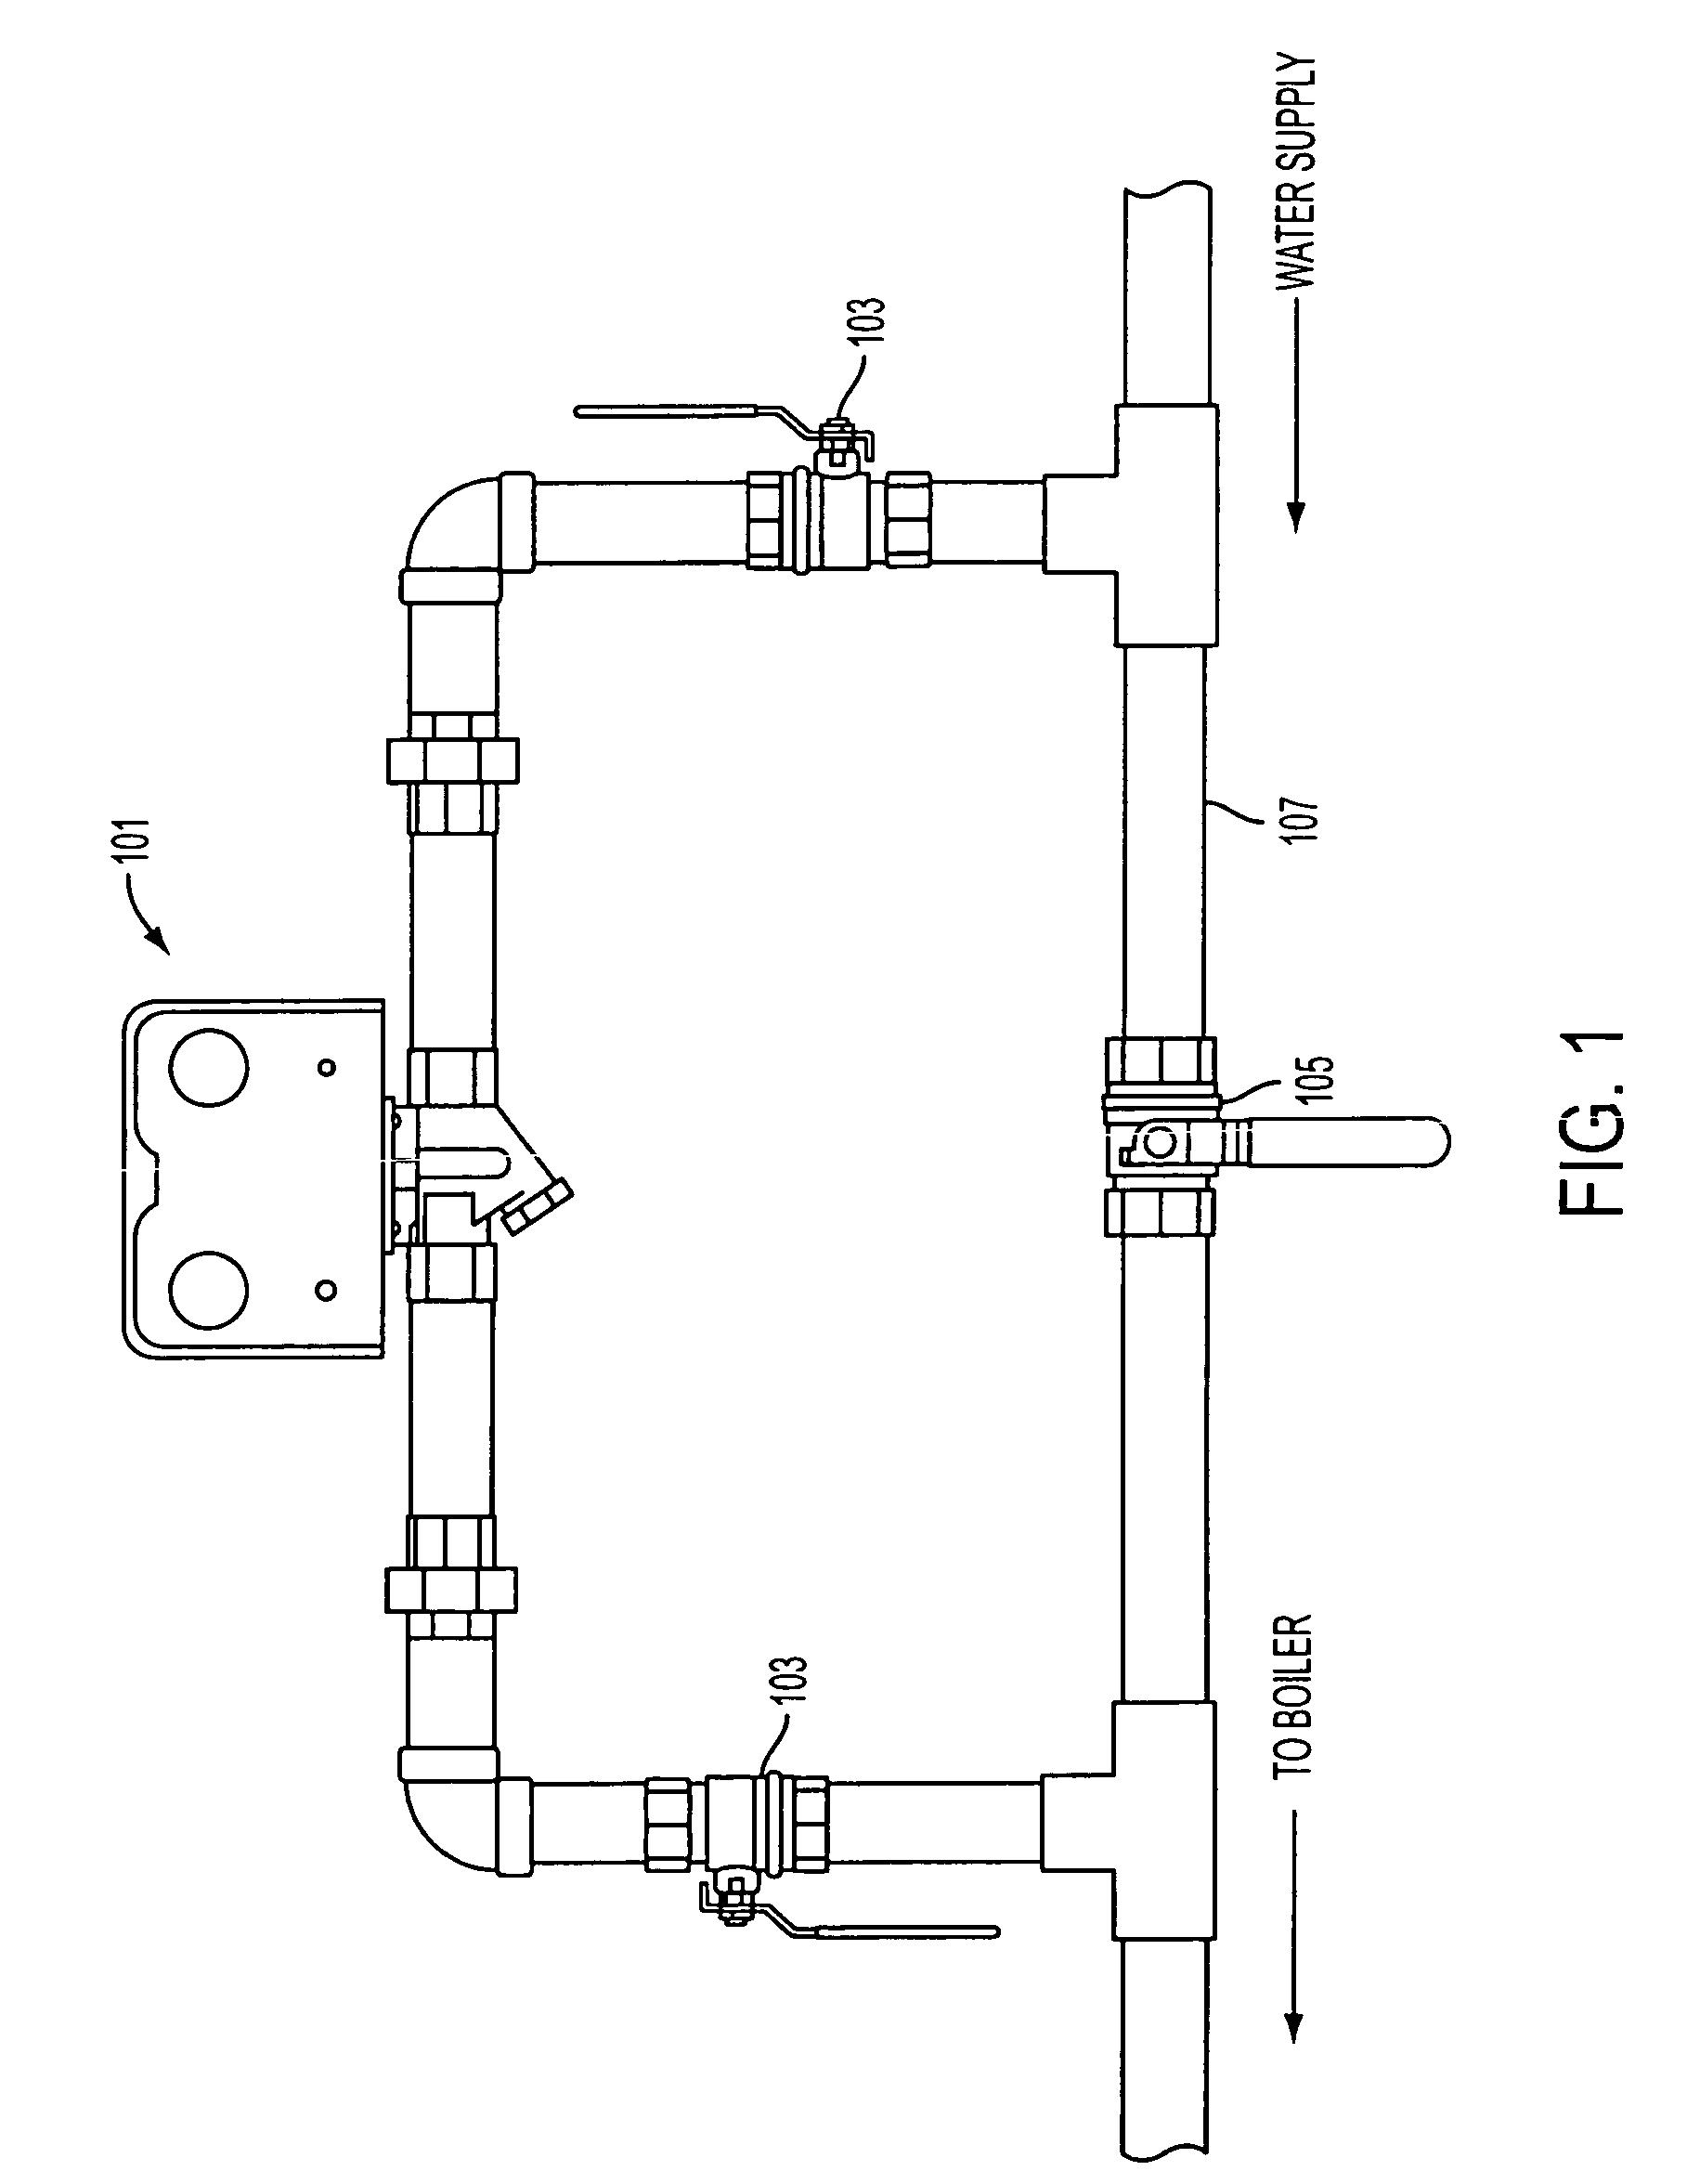 Wfe-24 Water Feeder Wiring Diagram